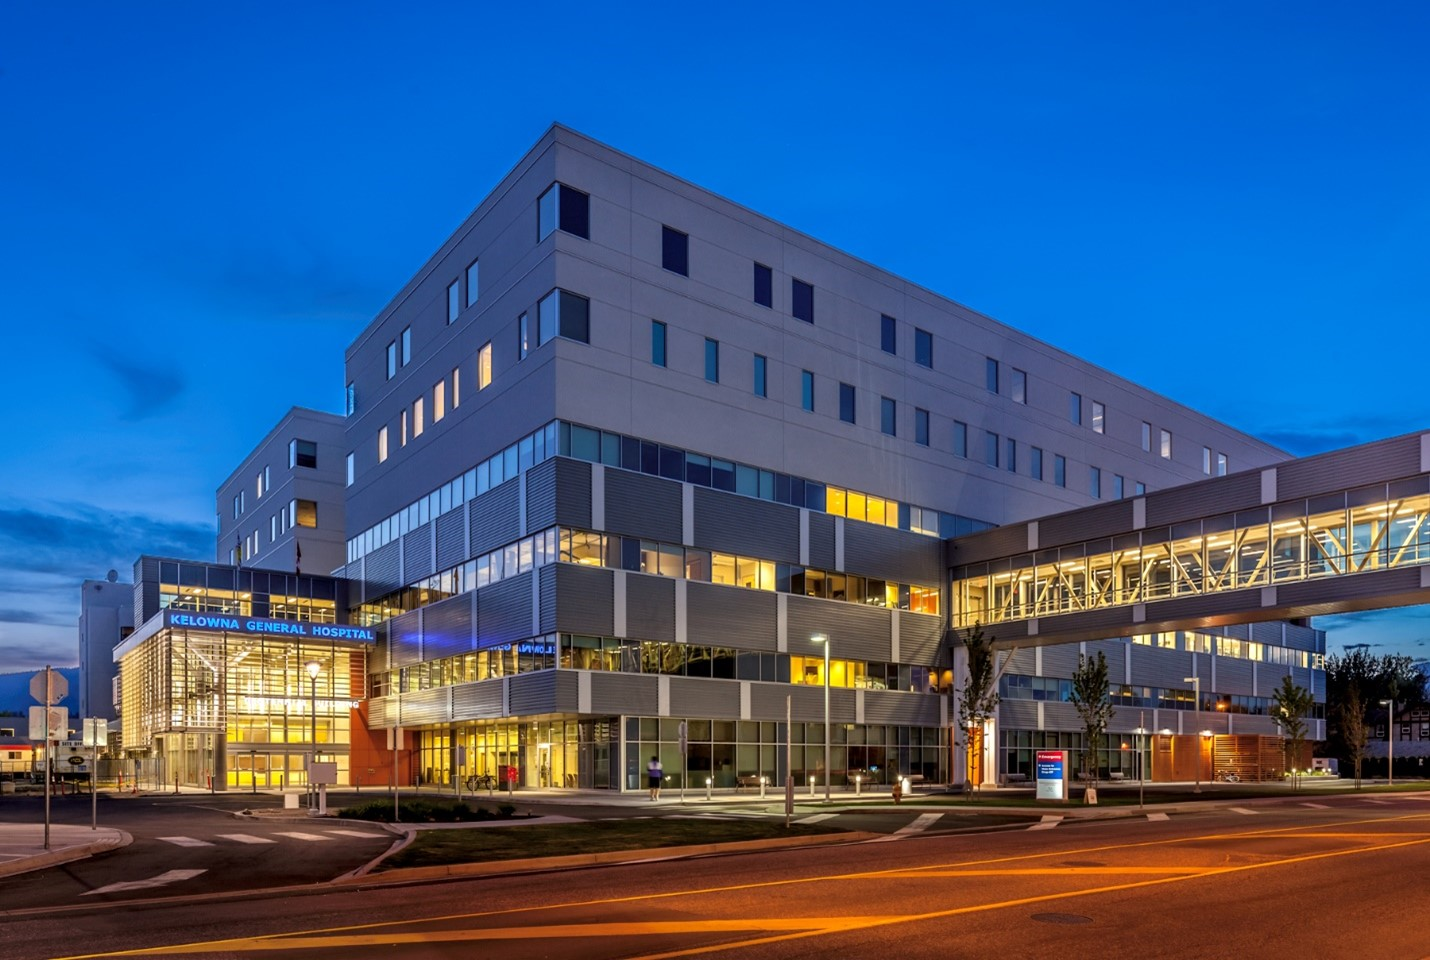 A photo of Kelowna General Hospital at dusk, with a dark blue sky.